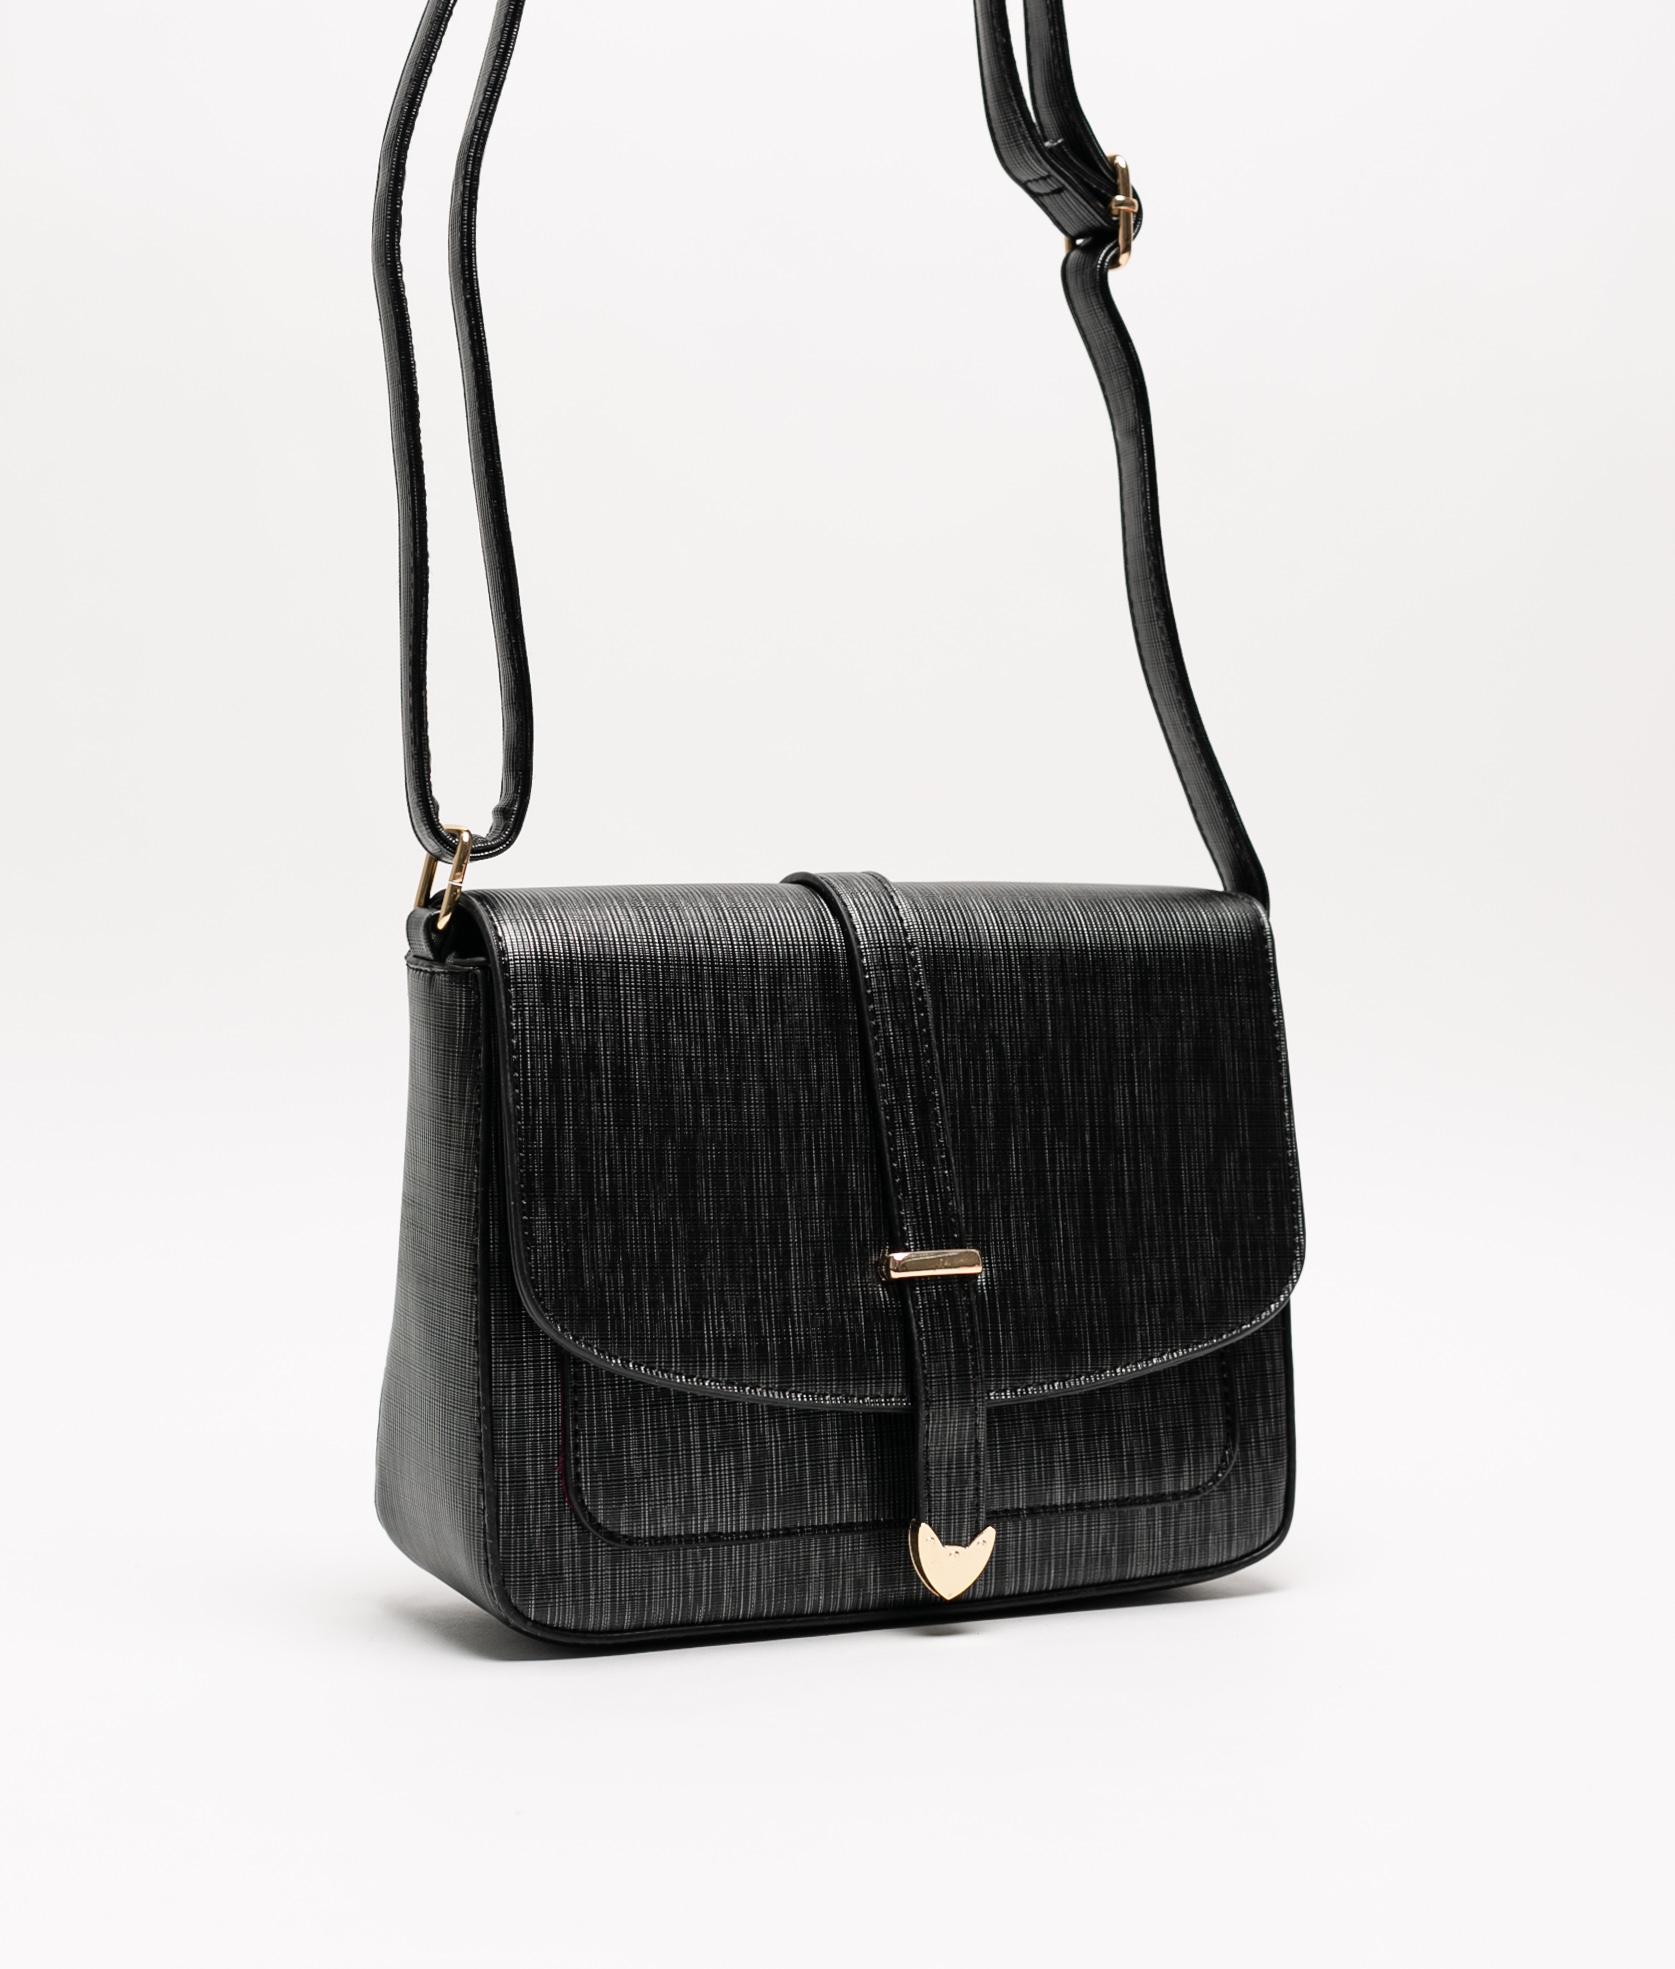 Tina shoulder bag - Black